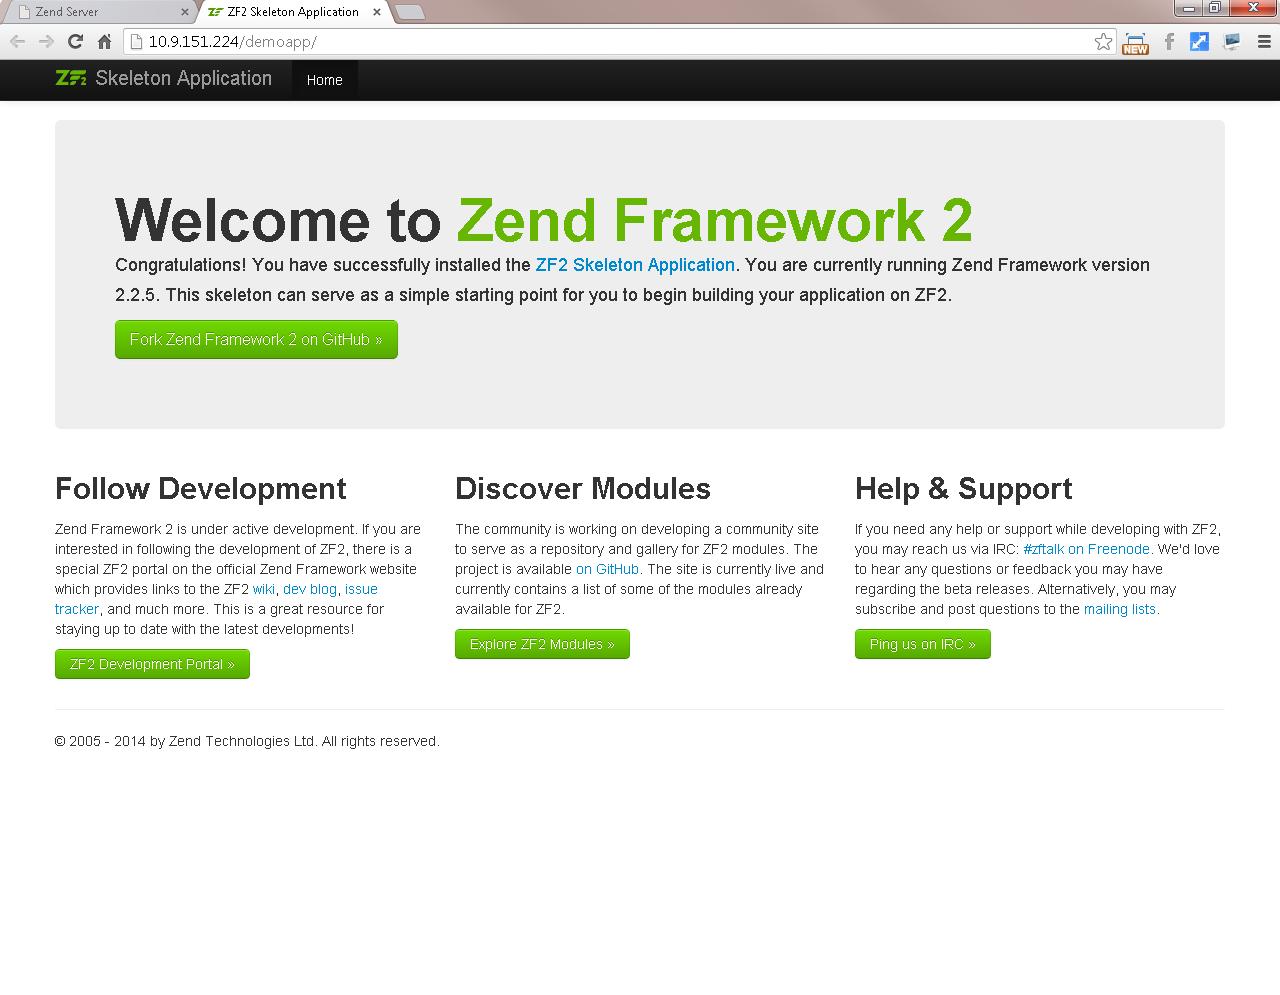 Step 4: Deploy the Demo Application- Zend Server 7